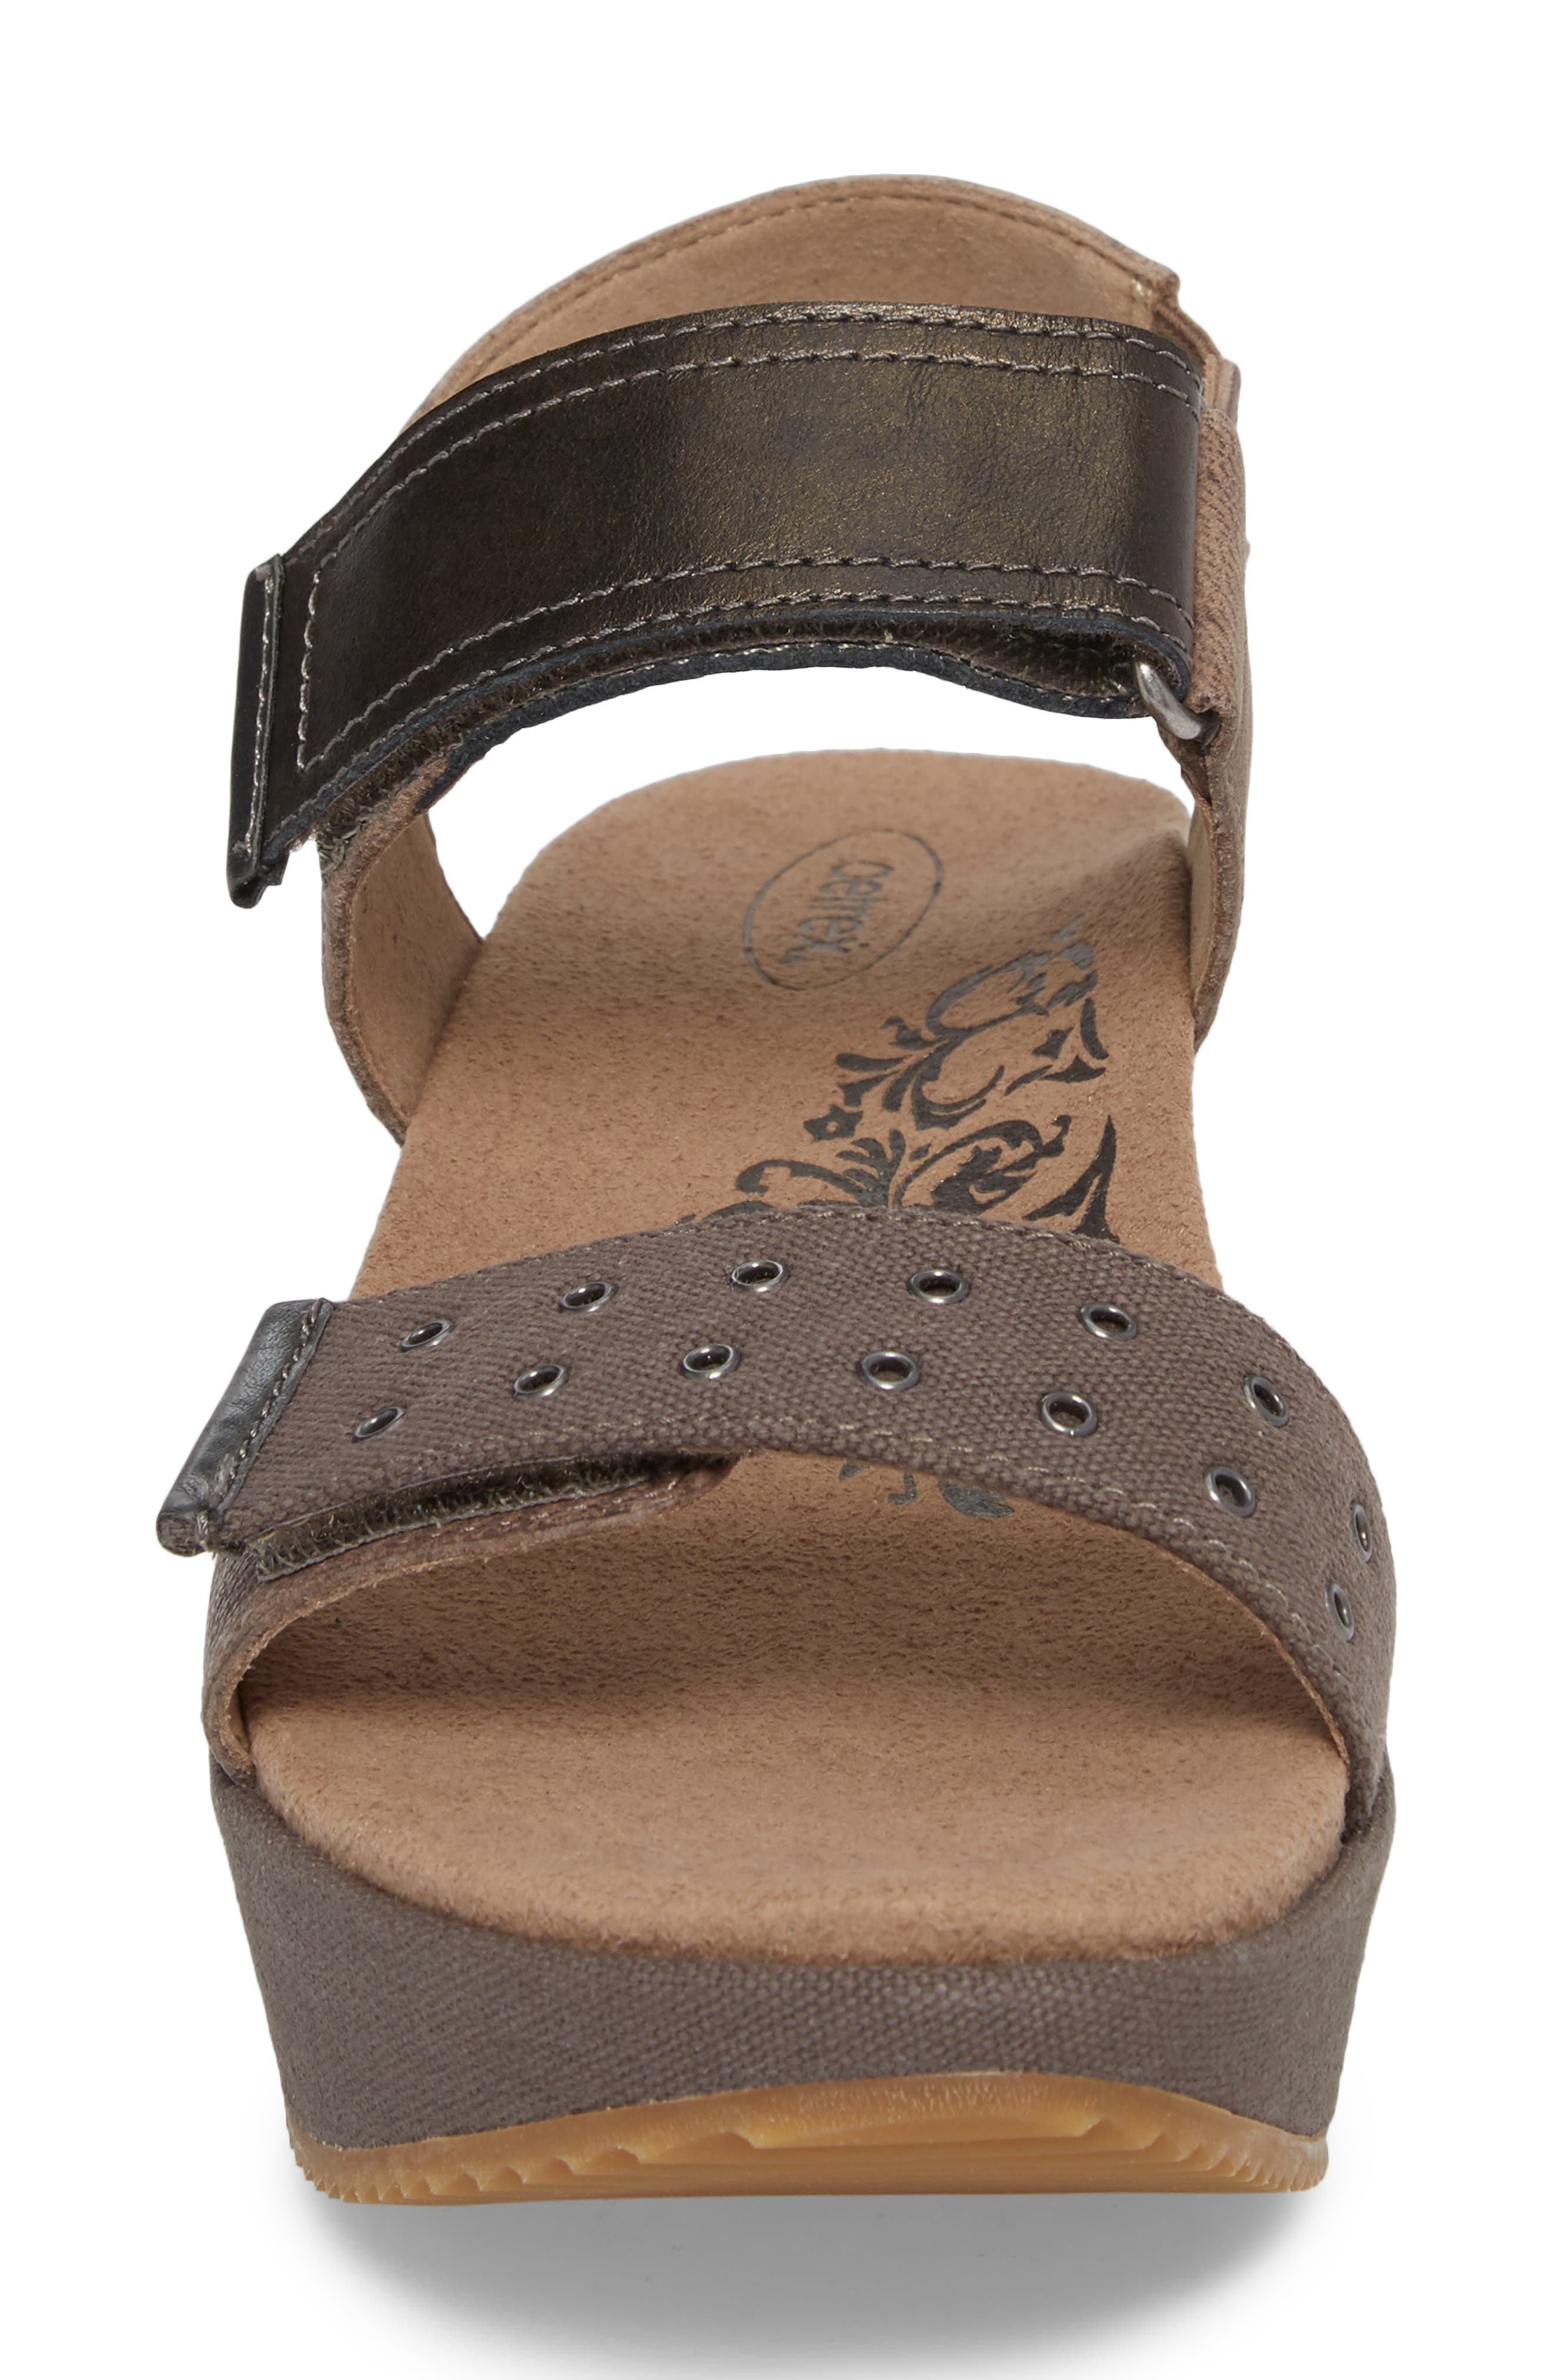 Tiffany Wedge Sandal,                             Alternate thumbnail 4, color,                             Stone Leather